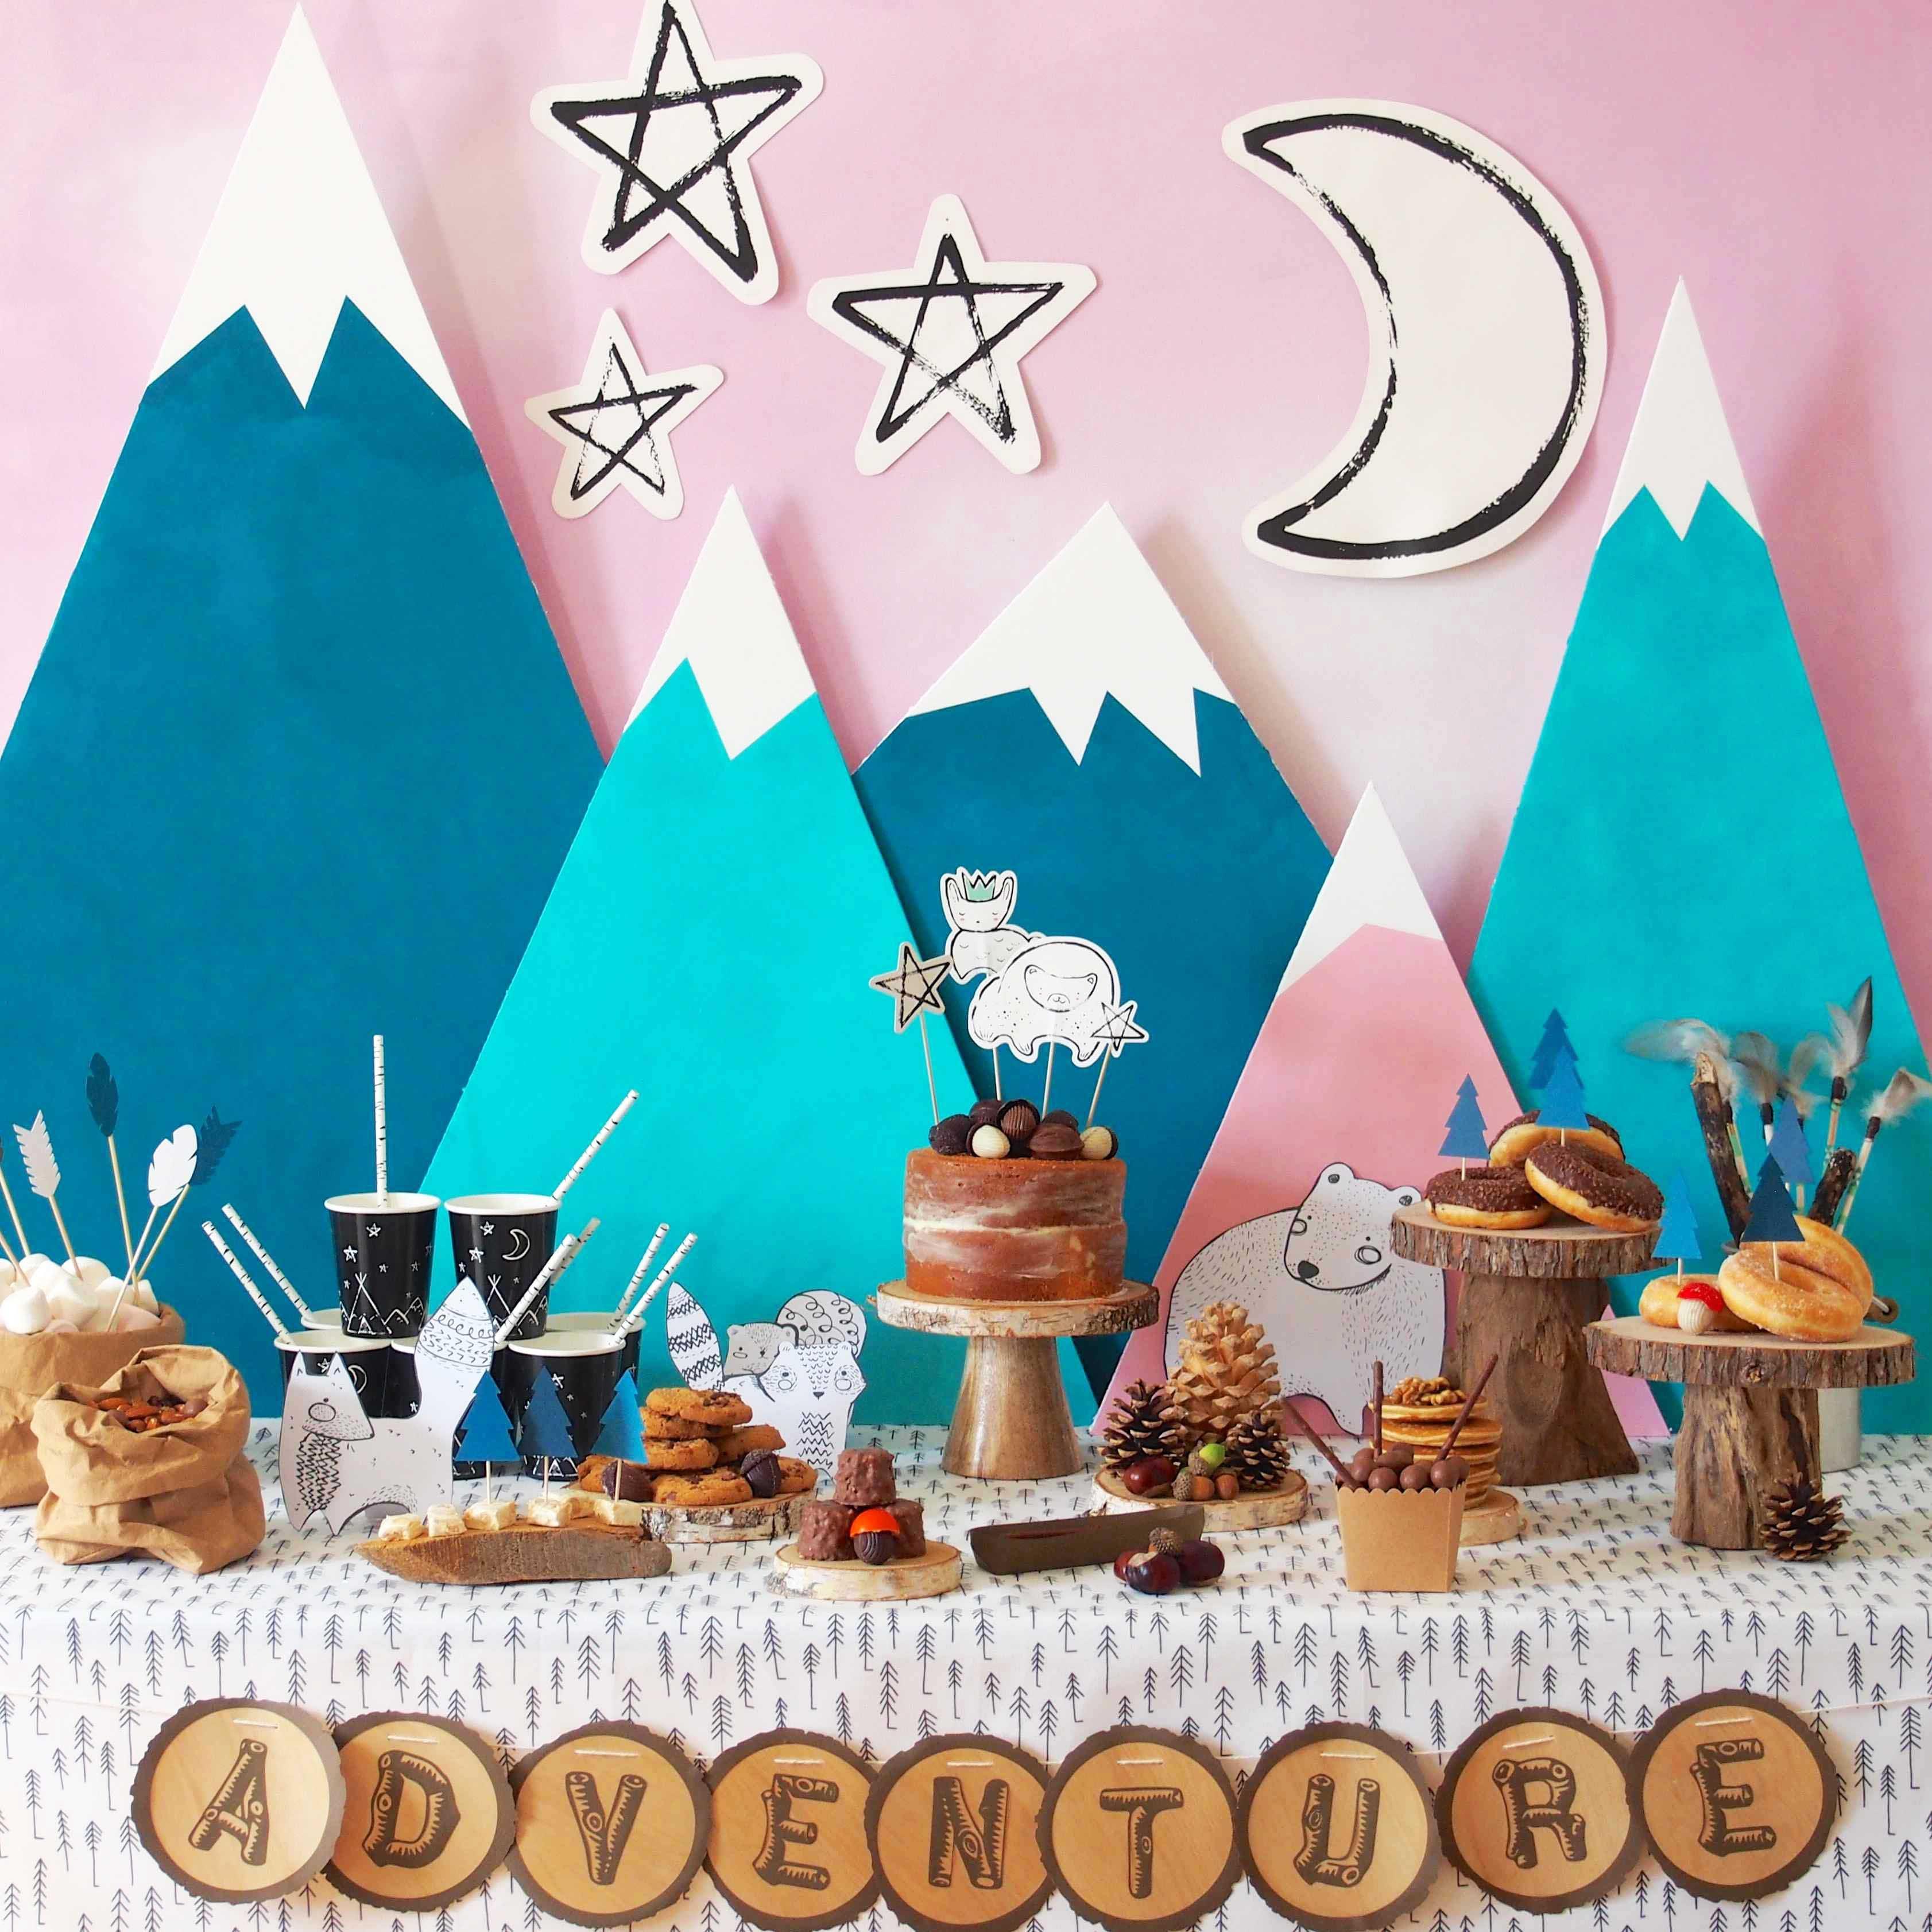 life is an adventure mariage pinterest de la. Black Bedroom Furniture Sets. Home Design Ideas